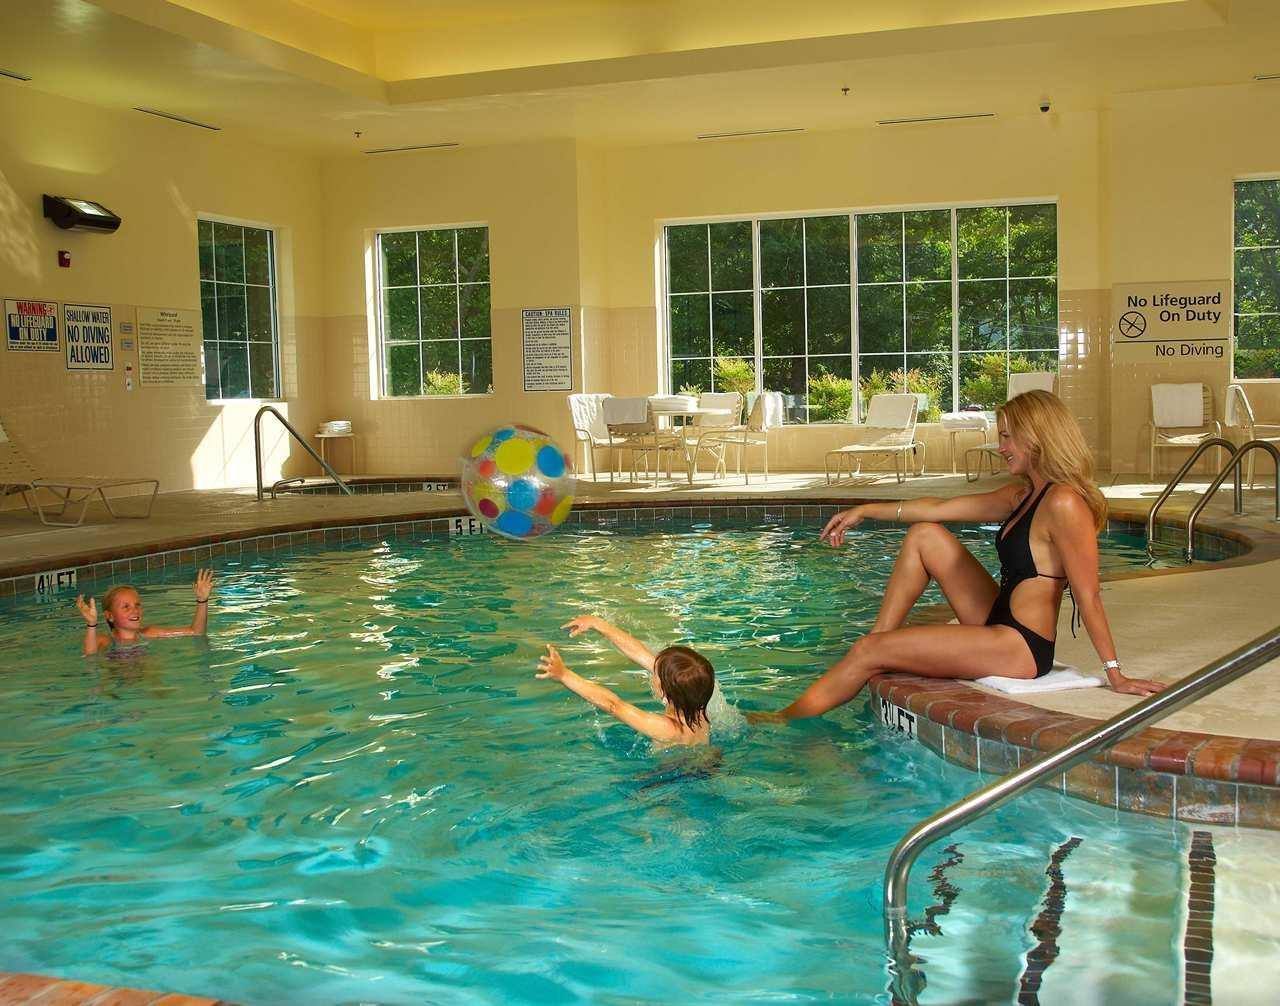 Hampton Inn & Suites Cashiers-Sapphire Valley image 7